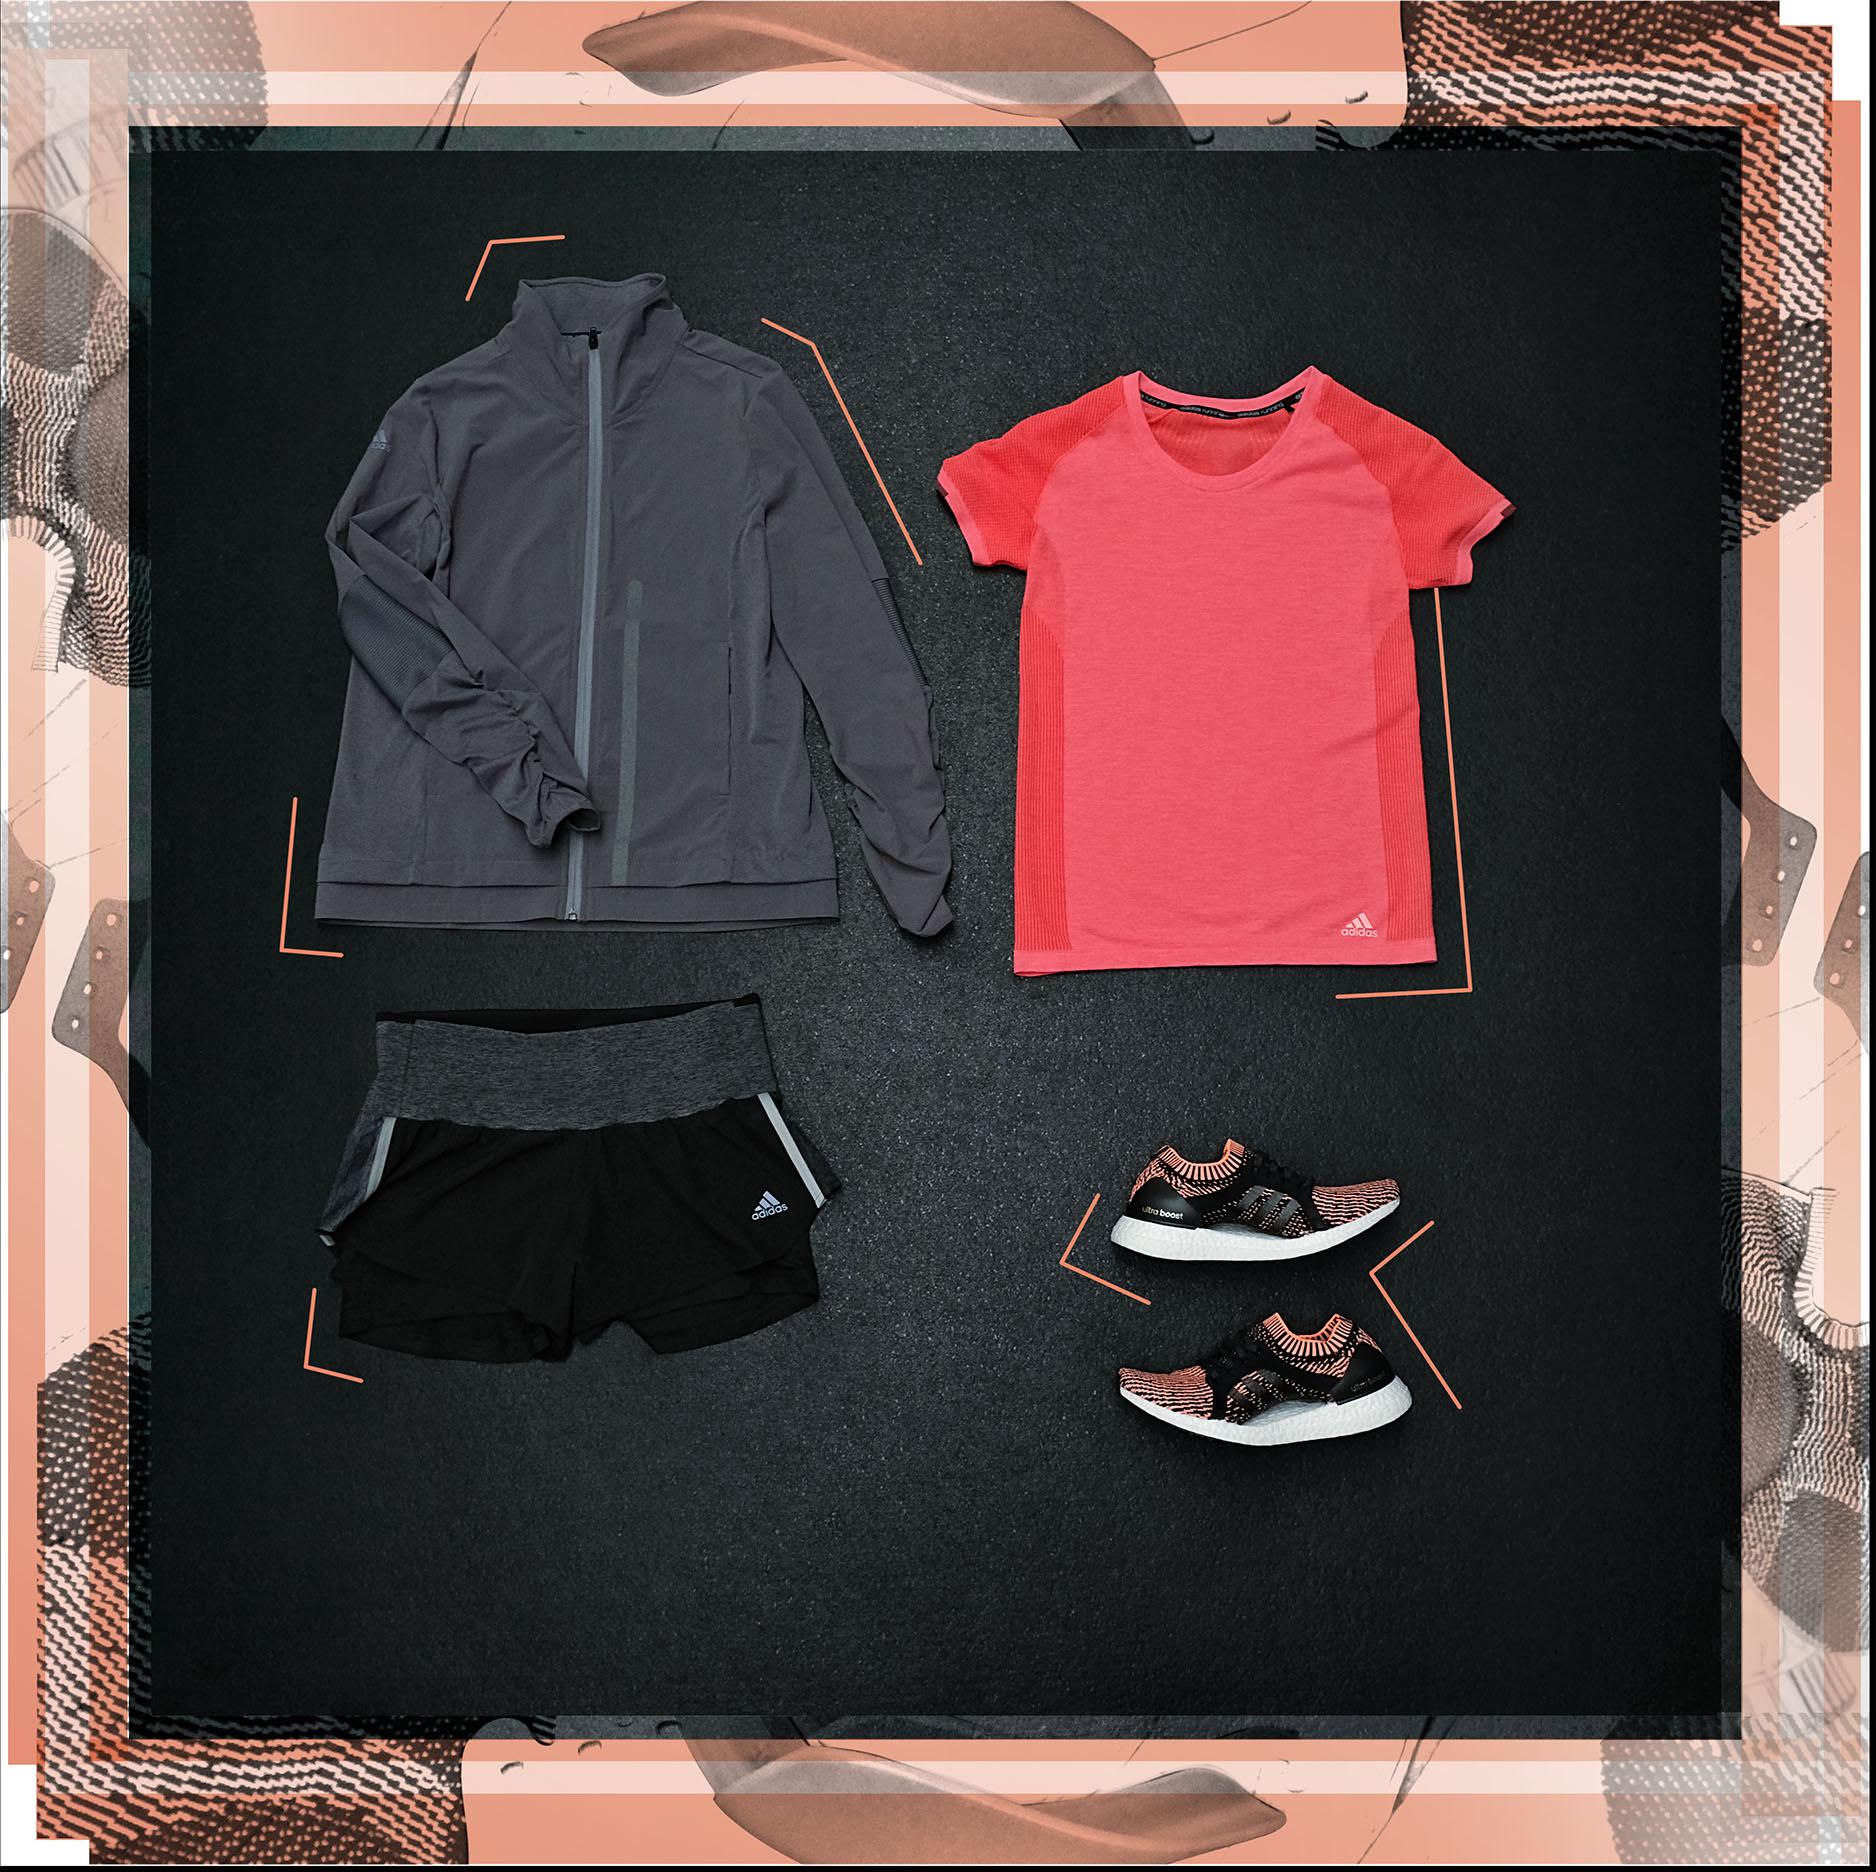 6d9bddf802c Η adidas παρουσιάζει το απόλυτο παπούτσι running σχεδιασμένο αποκλειστικά  για γυναίκες, το νέο UltraBOOST X